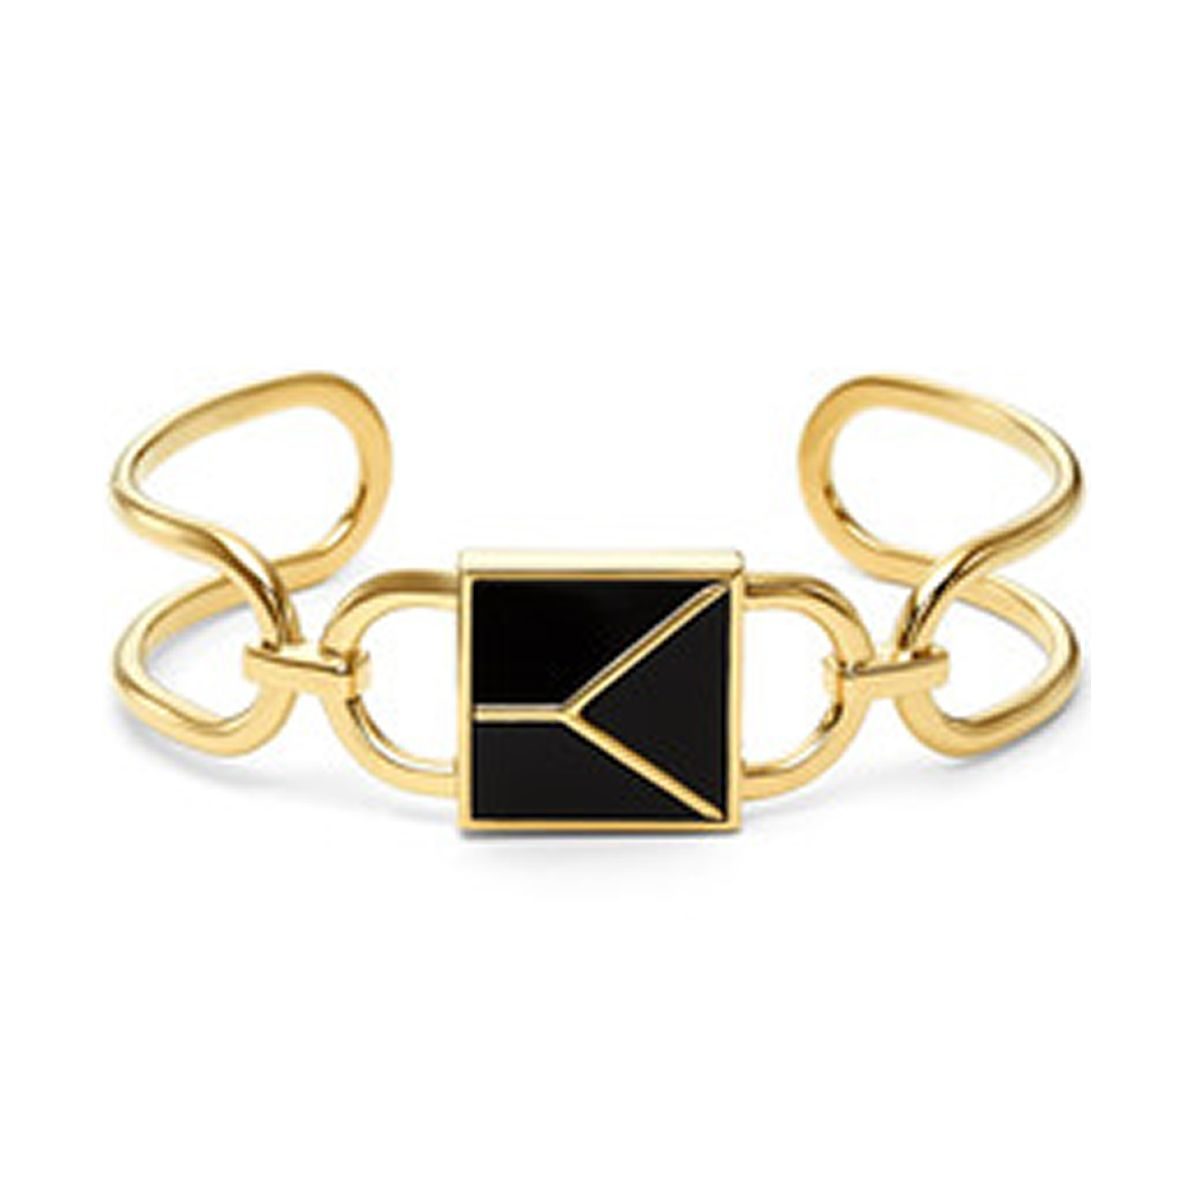 5633b3173a4 Michael Kors Jewelry - Macy s